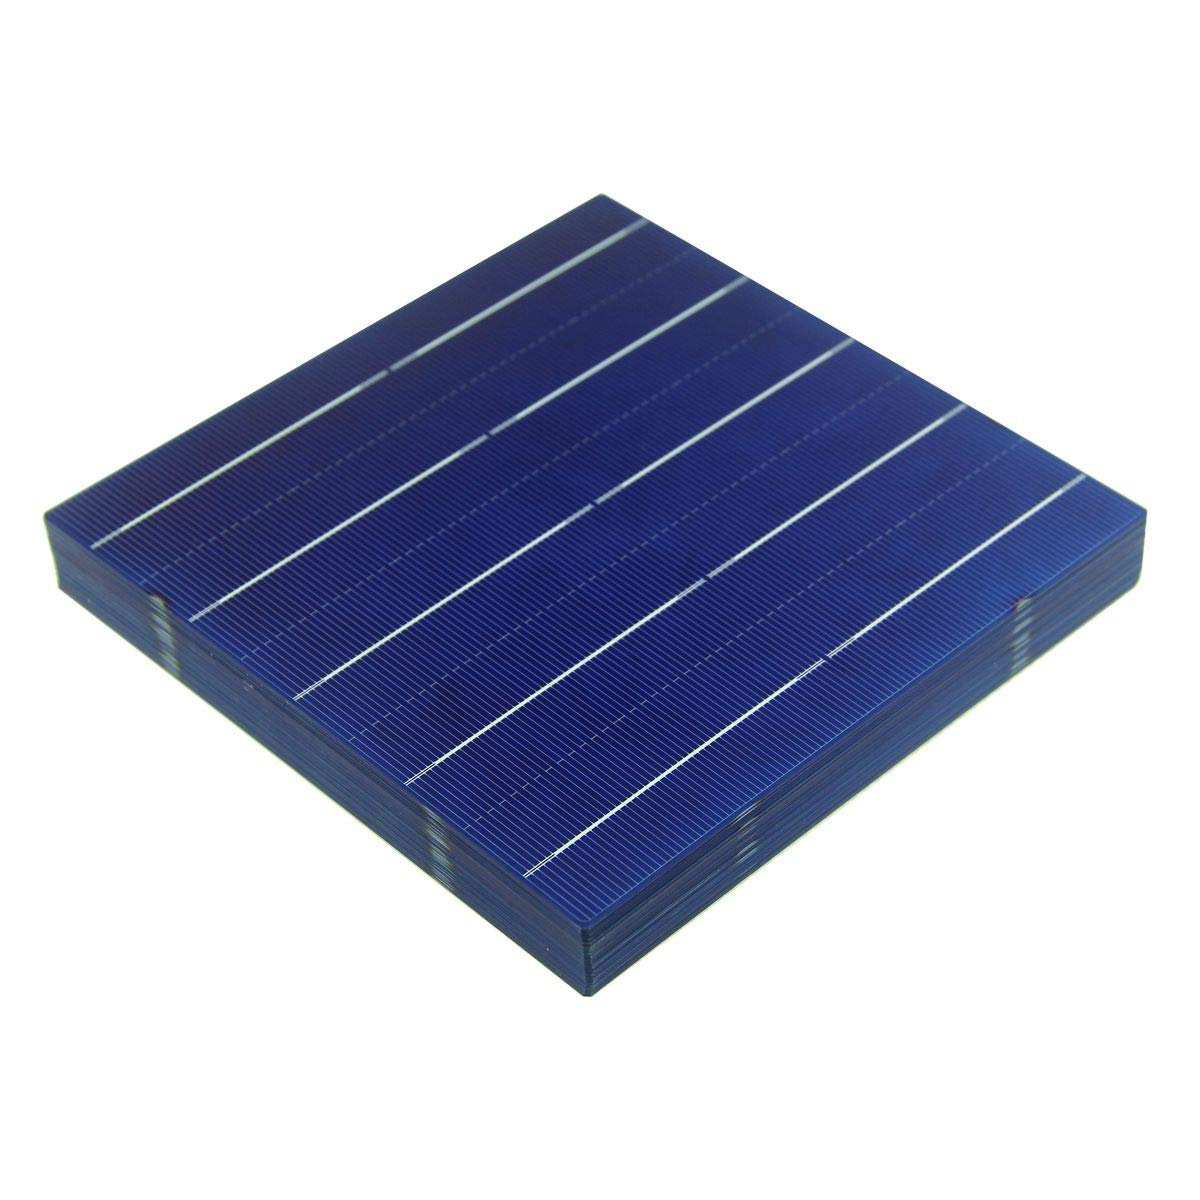 VIKOCELL 156MM 40Pcs 4.5W Polycrystalline Silicon Solar Panel Solar Cells 6×6 for DIY Solar Panel